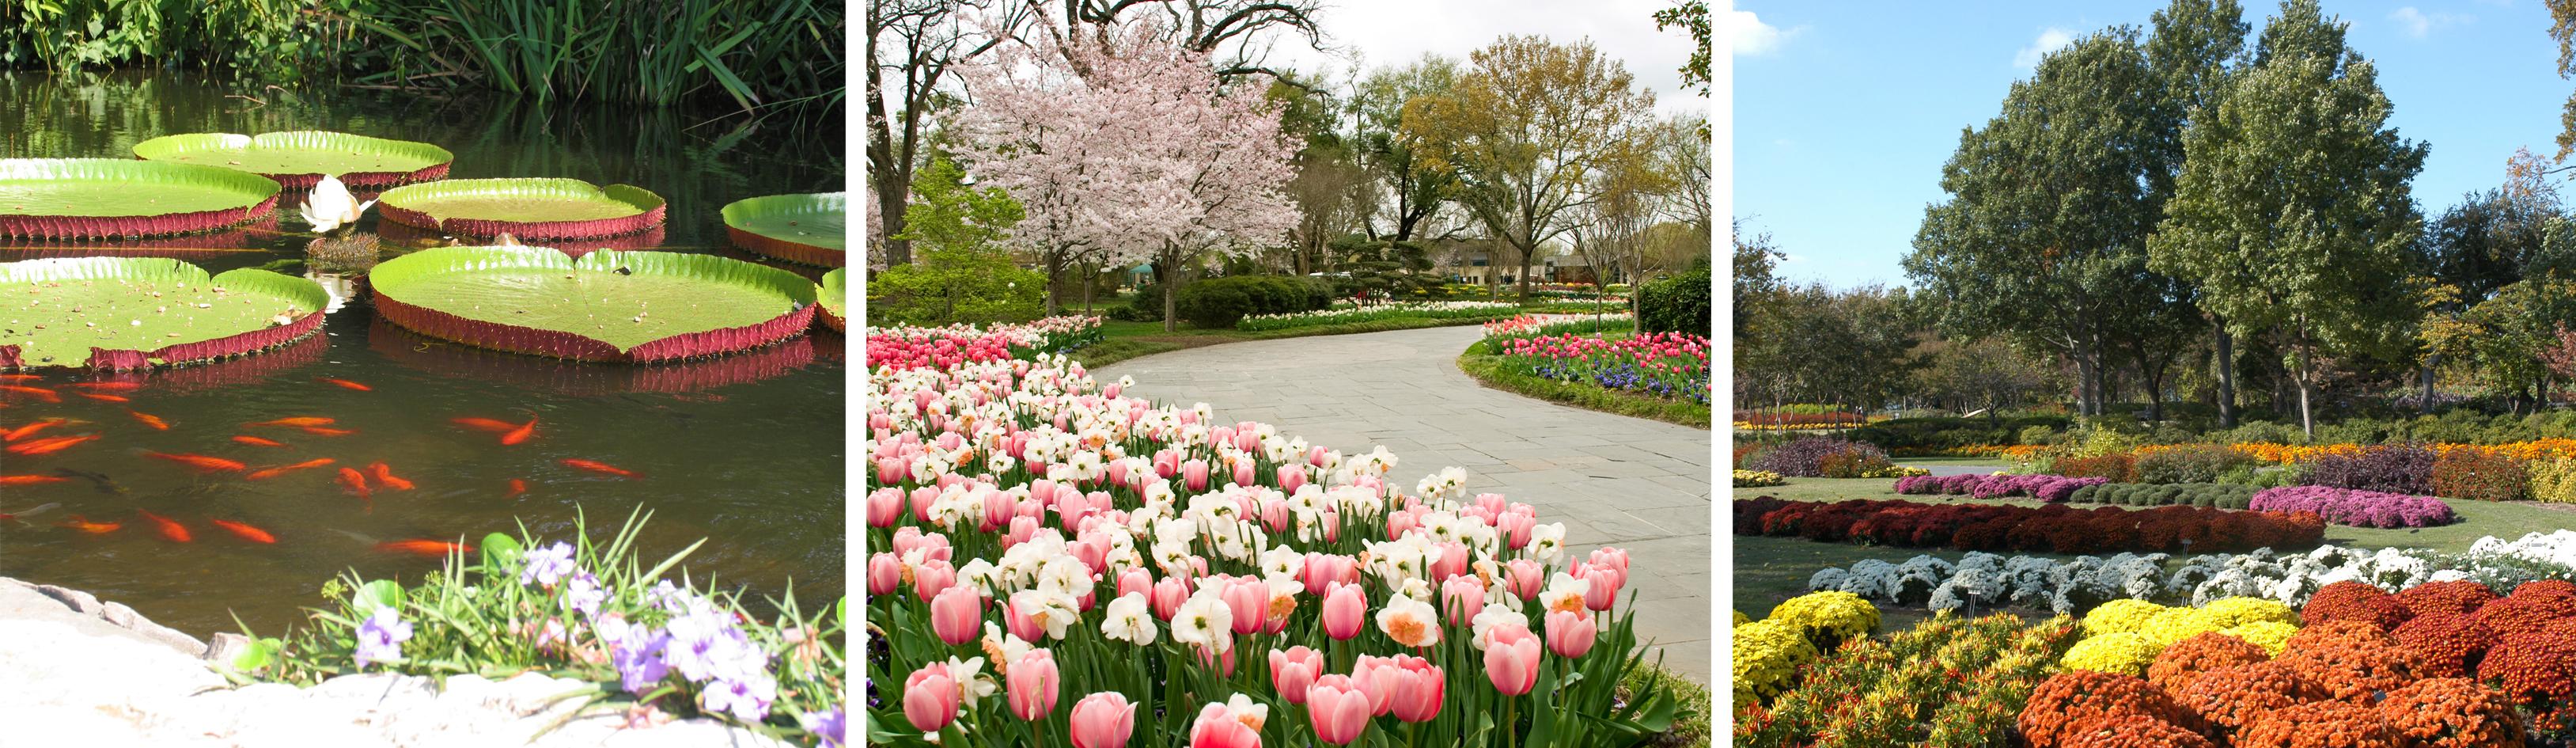 File:Dallas Arboretum Seasons